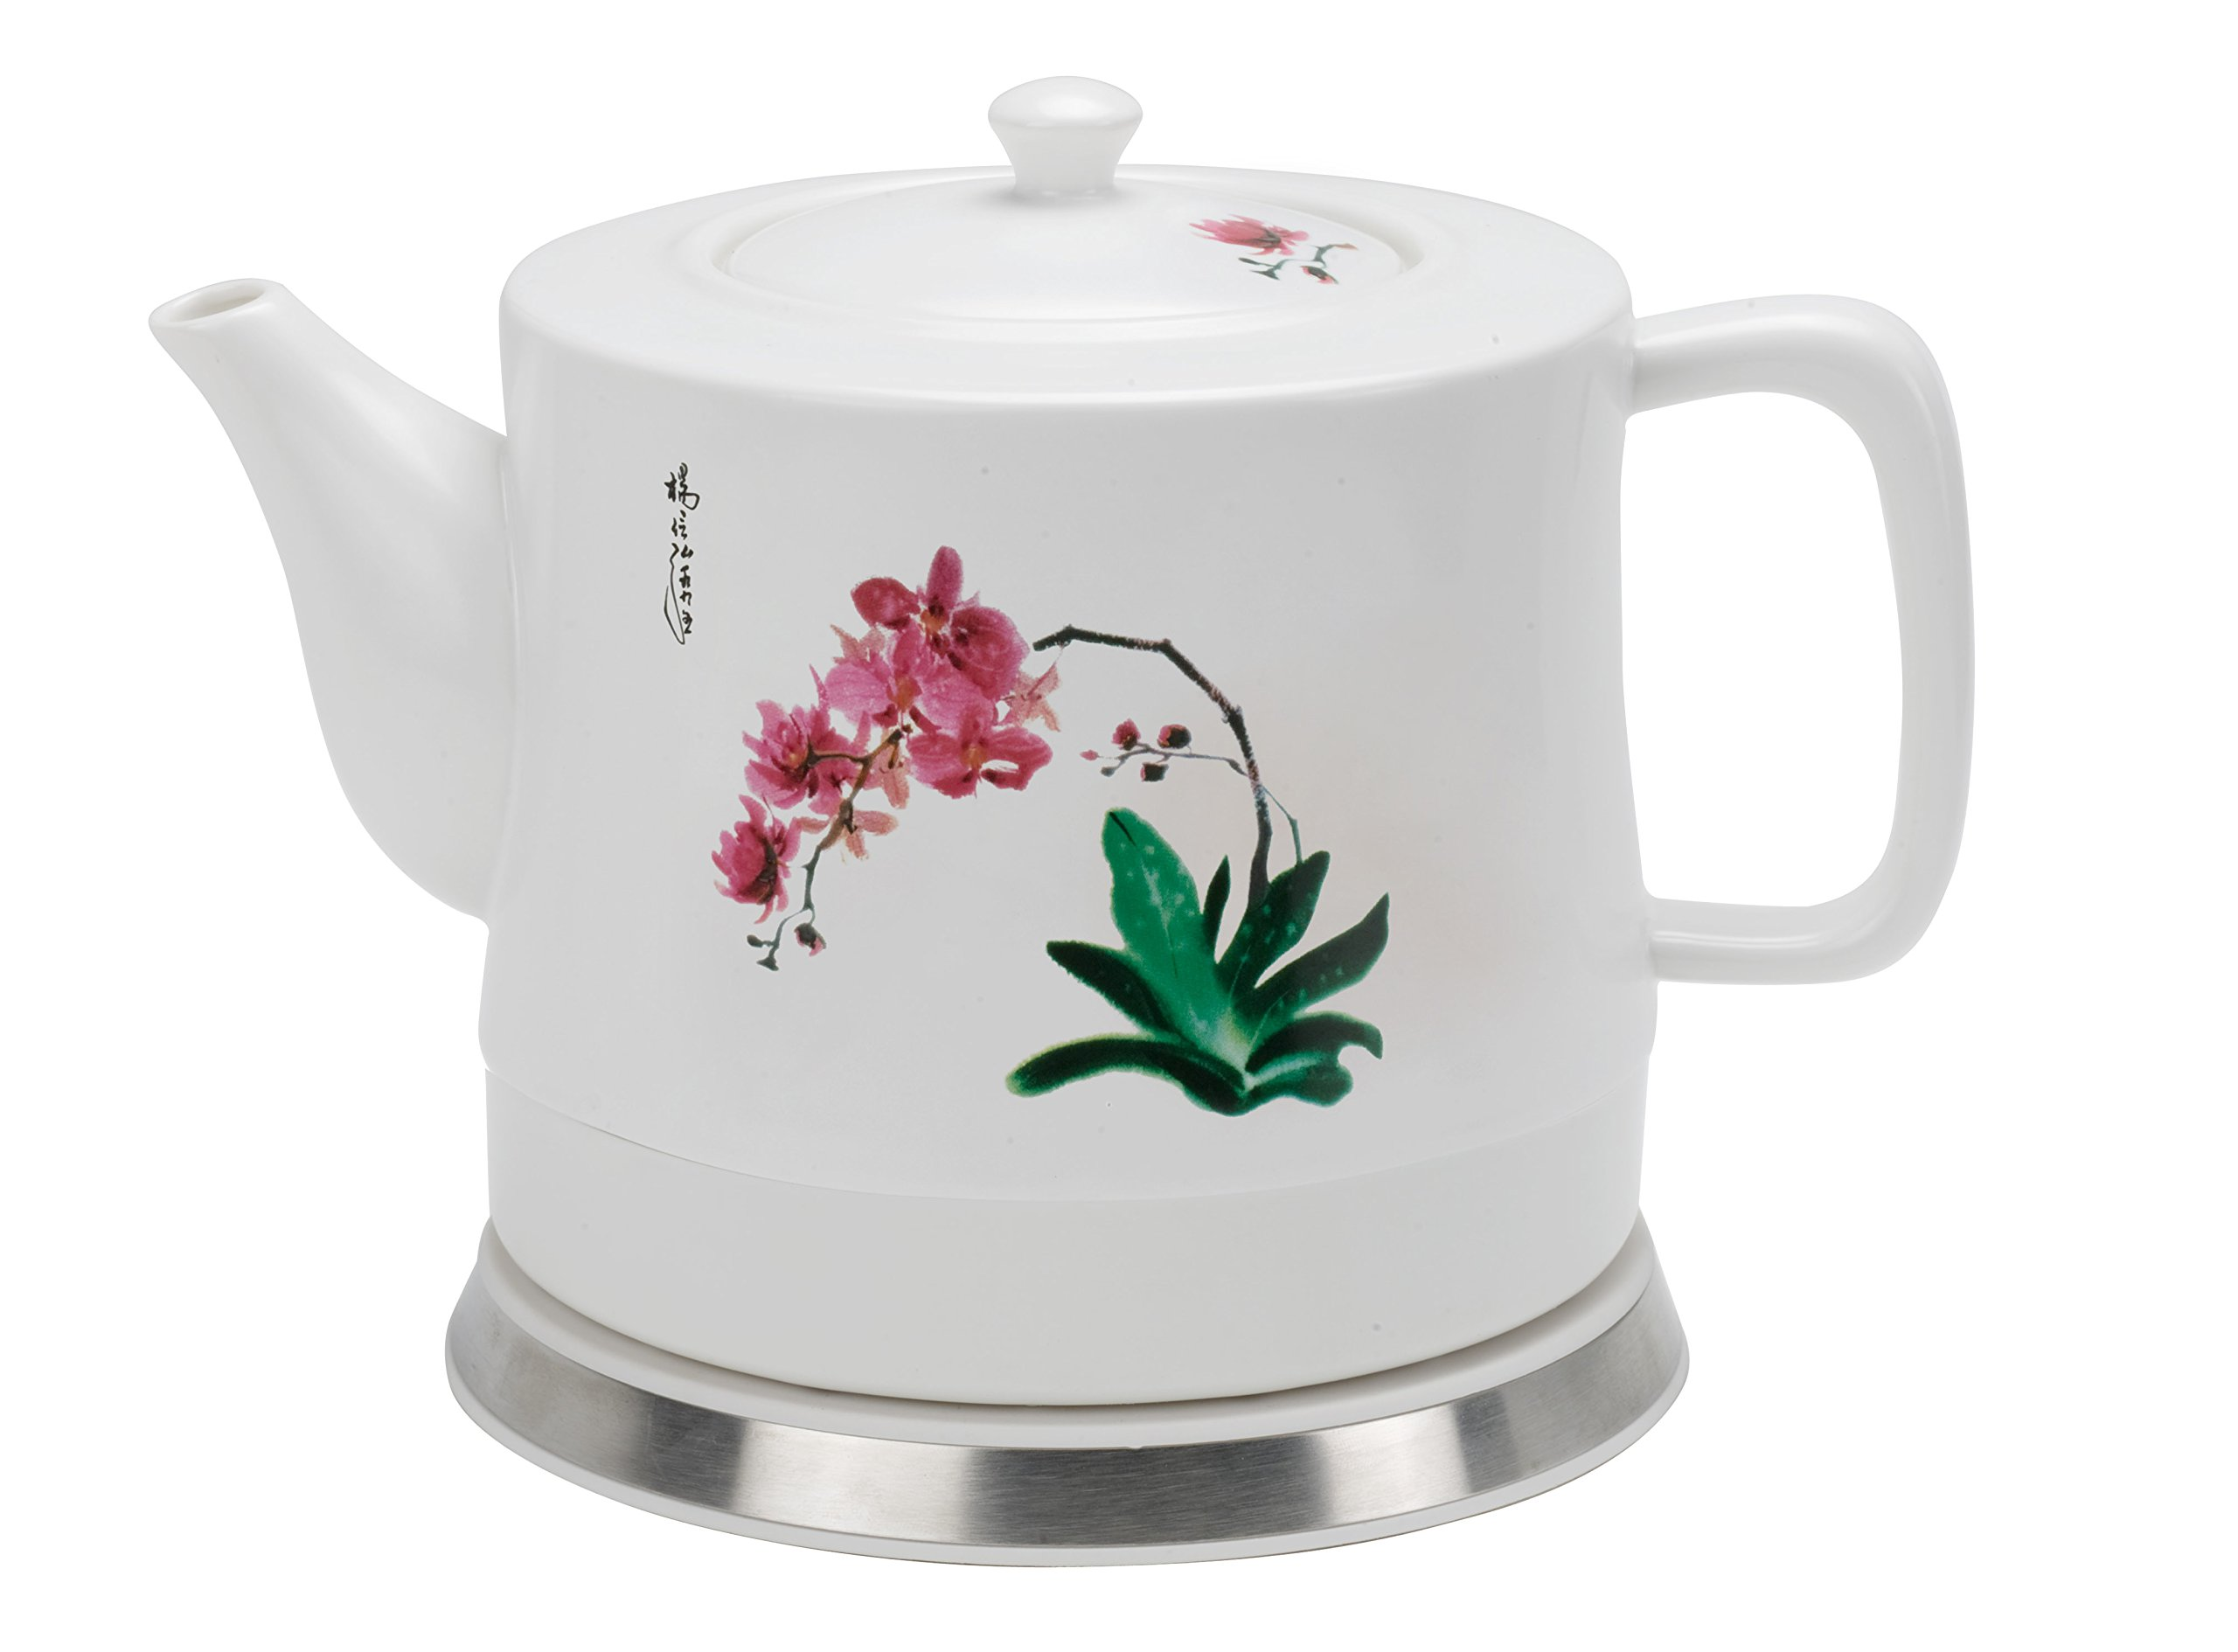 FixtureDisplays Teapot, Ceramic w/electronic Steeping/Warm Station 12030